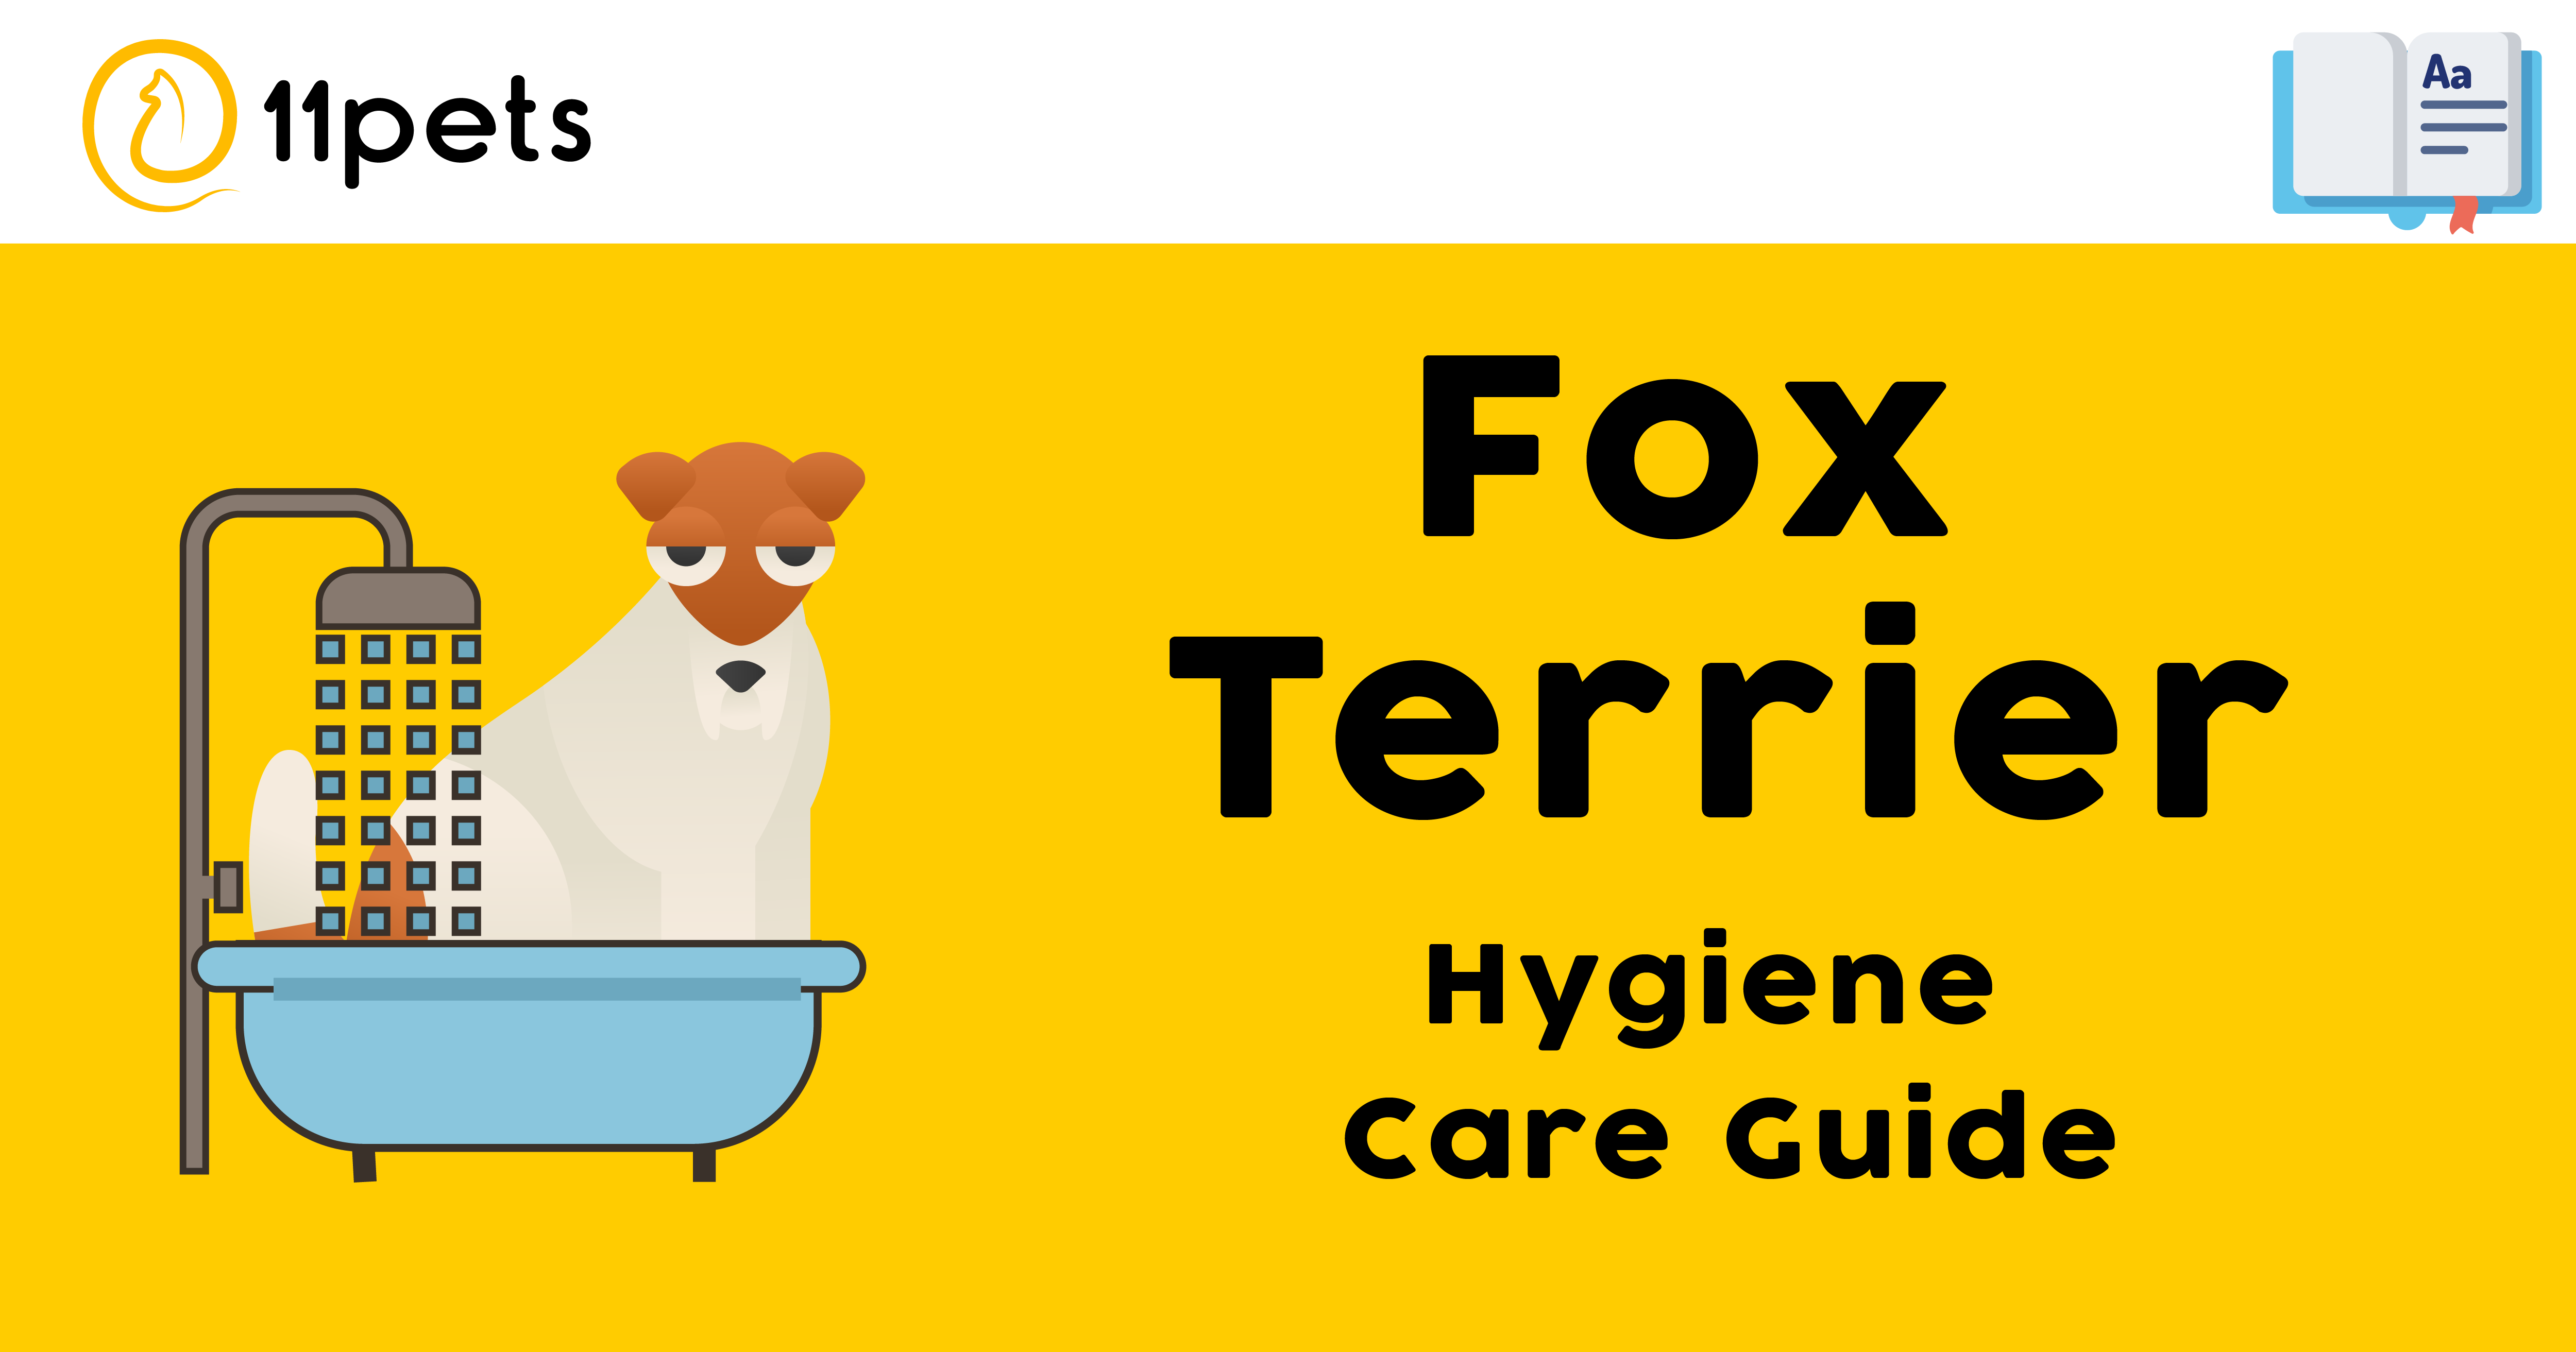 Hygiene Care Guide for Fox Terrier